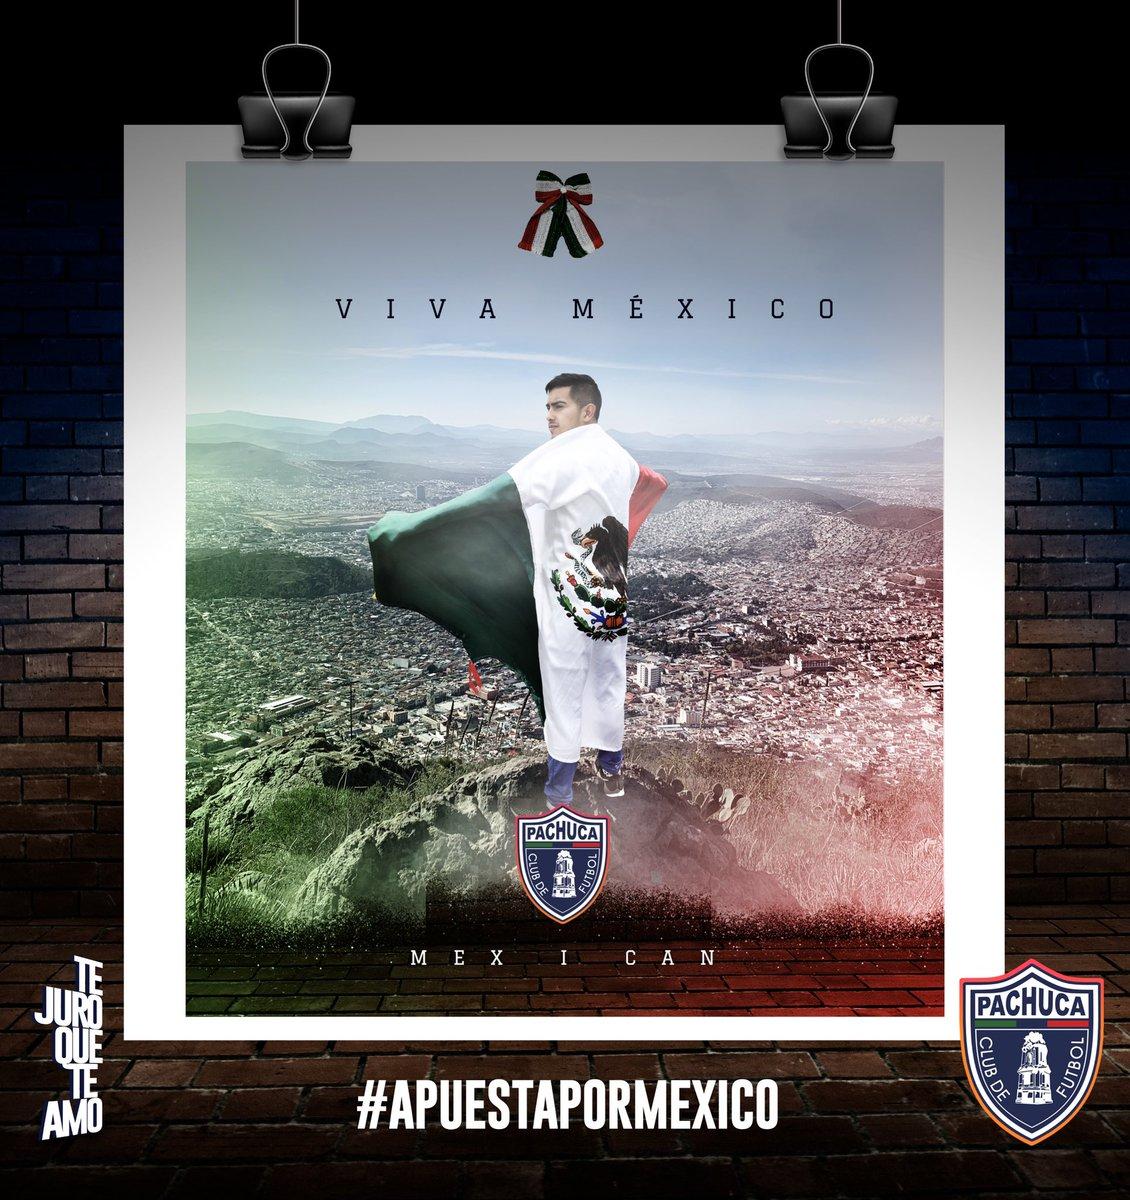 🎉💚🎉🤍🎉❤️🎉🤍🎉❤️🎉🤍🎉  Desde #Pachuca la 'Bella Airosa'... ¡QUE VIVA MÉXICO! 🇲🇽  #16DeSeptiembre #TeJuroQueTeAmo💙   🎉💚🎉🤍🎉❤️🎉💚🎉🤍🎉❤️🎉 https://t.co/2hvbku7UBT